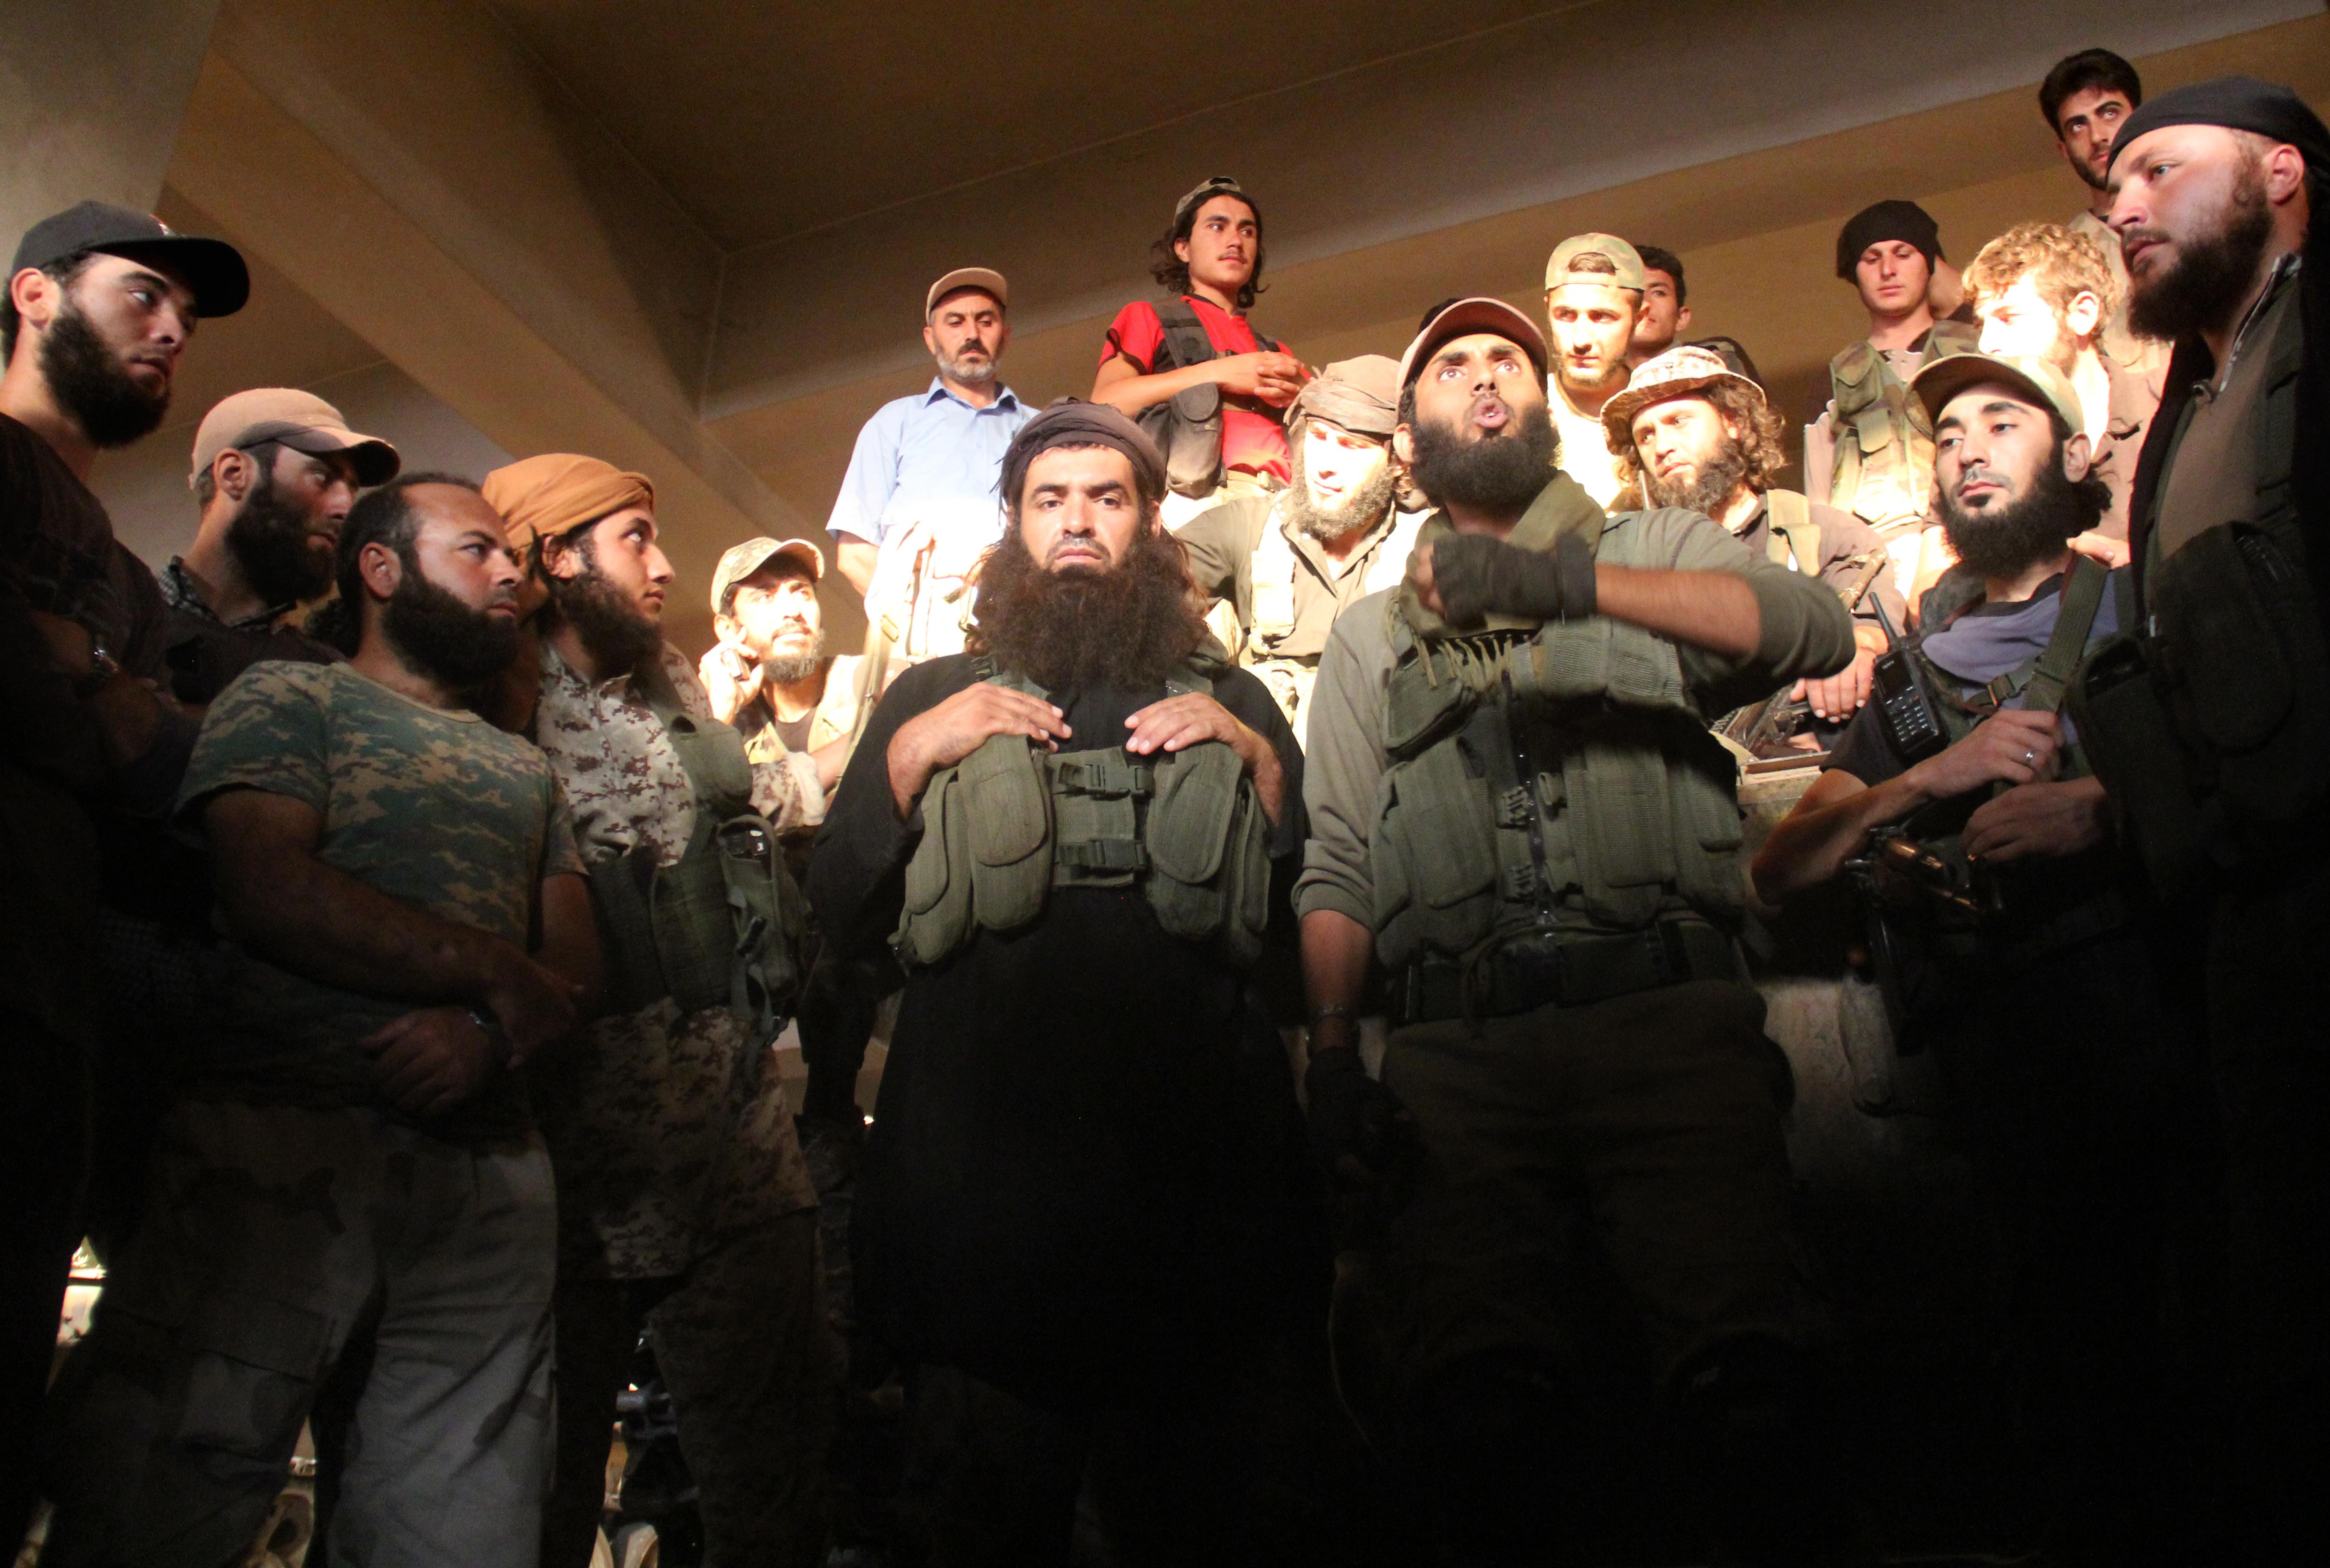 Hizbullah's Syria involvement brings instability to Lebanon